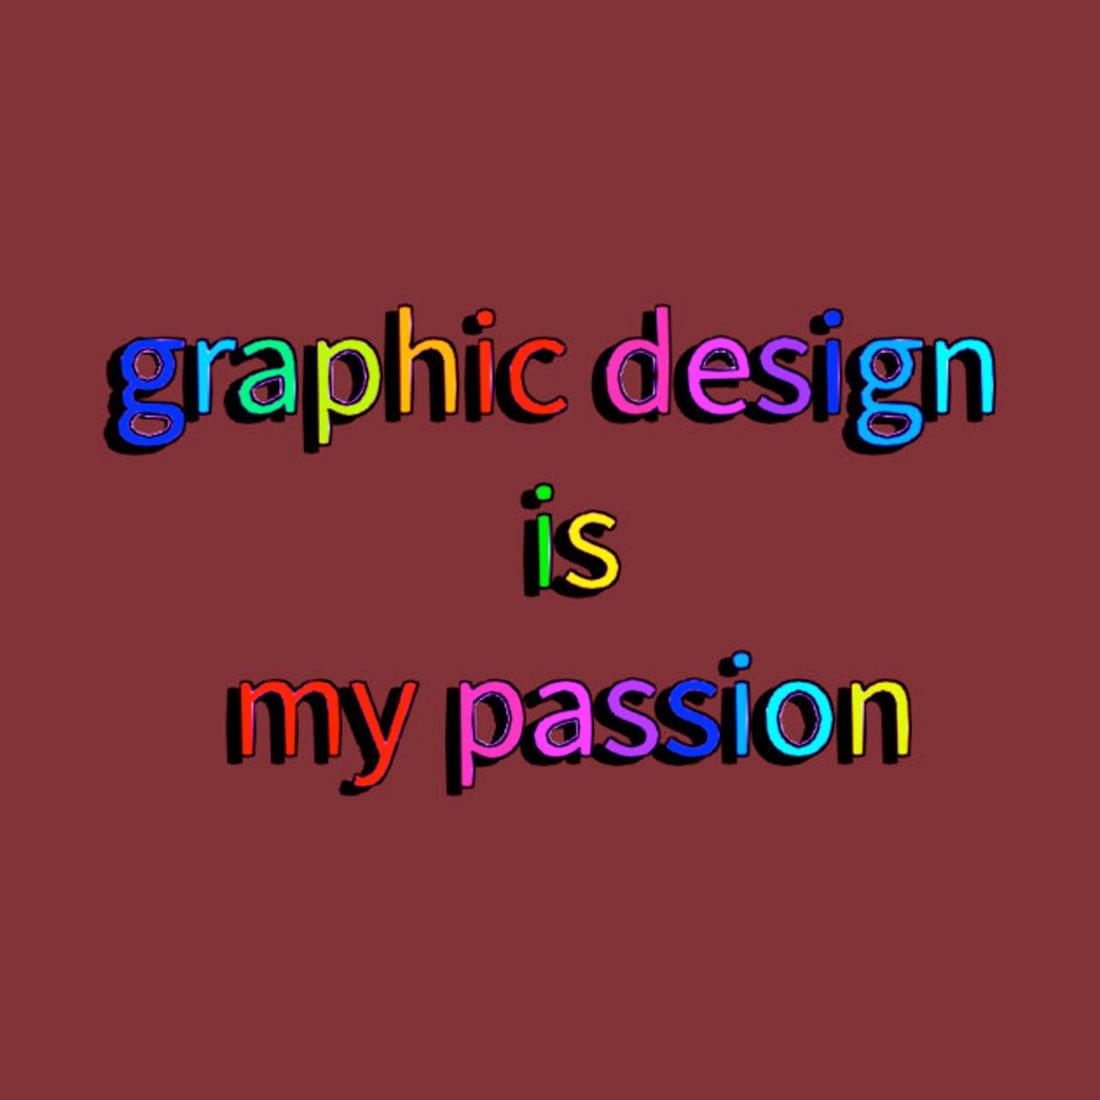 passion-rainbow Graphic Design Is My Passion: 20 Meme Picks design tips